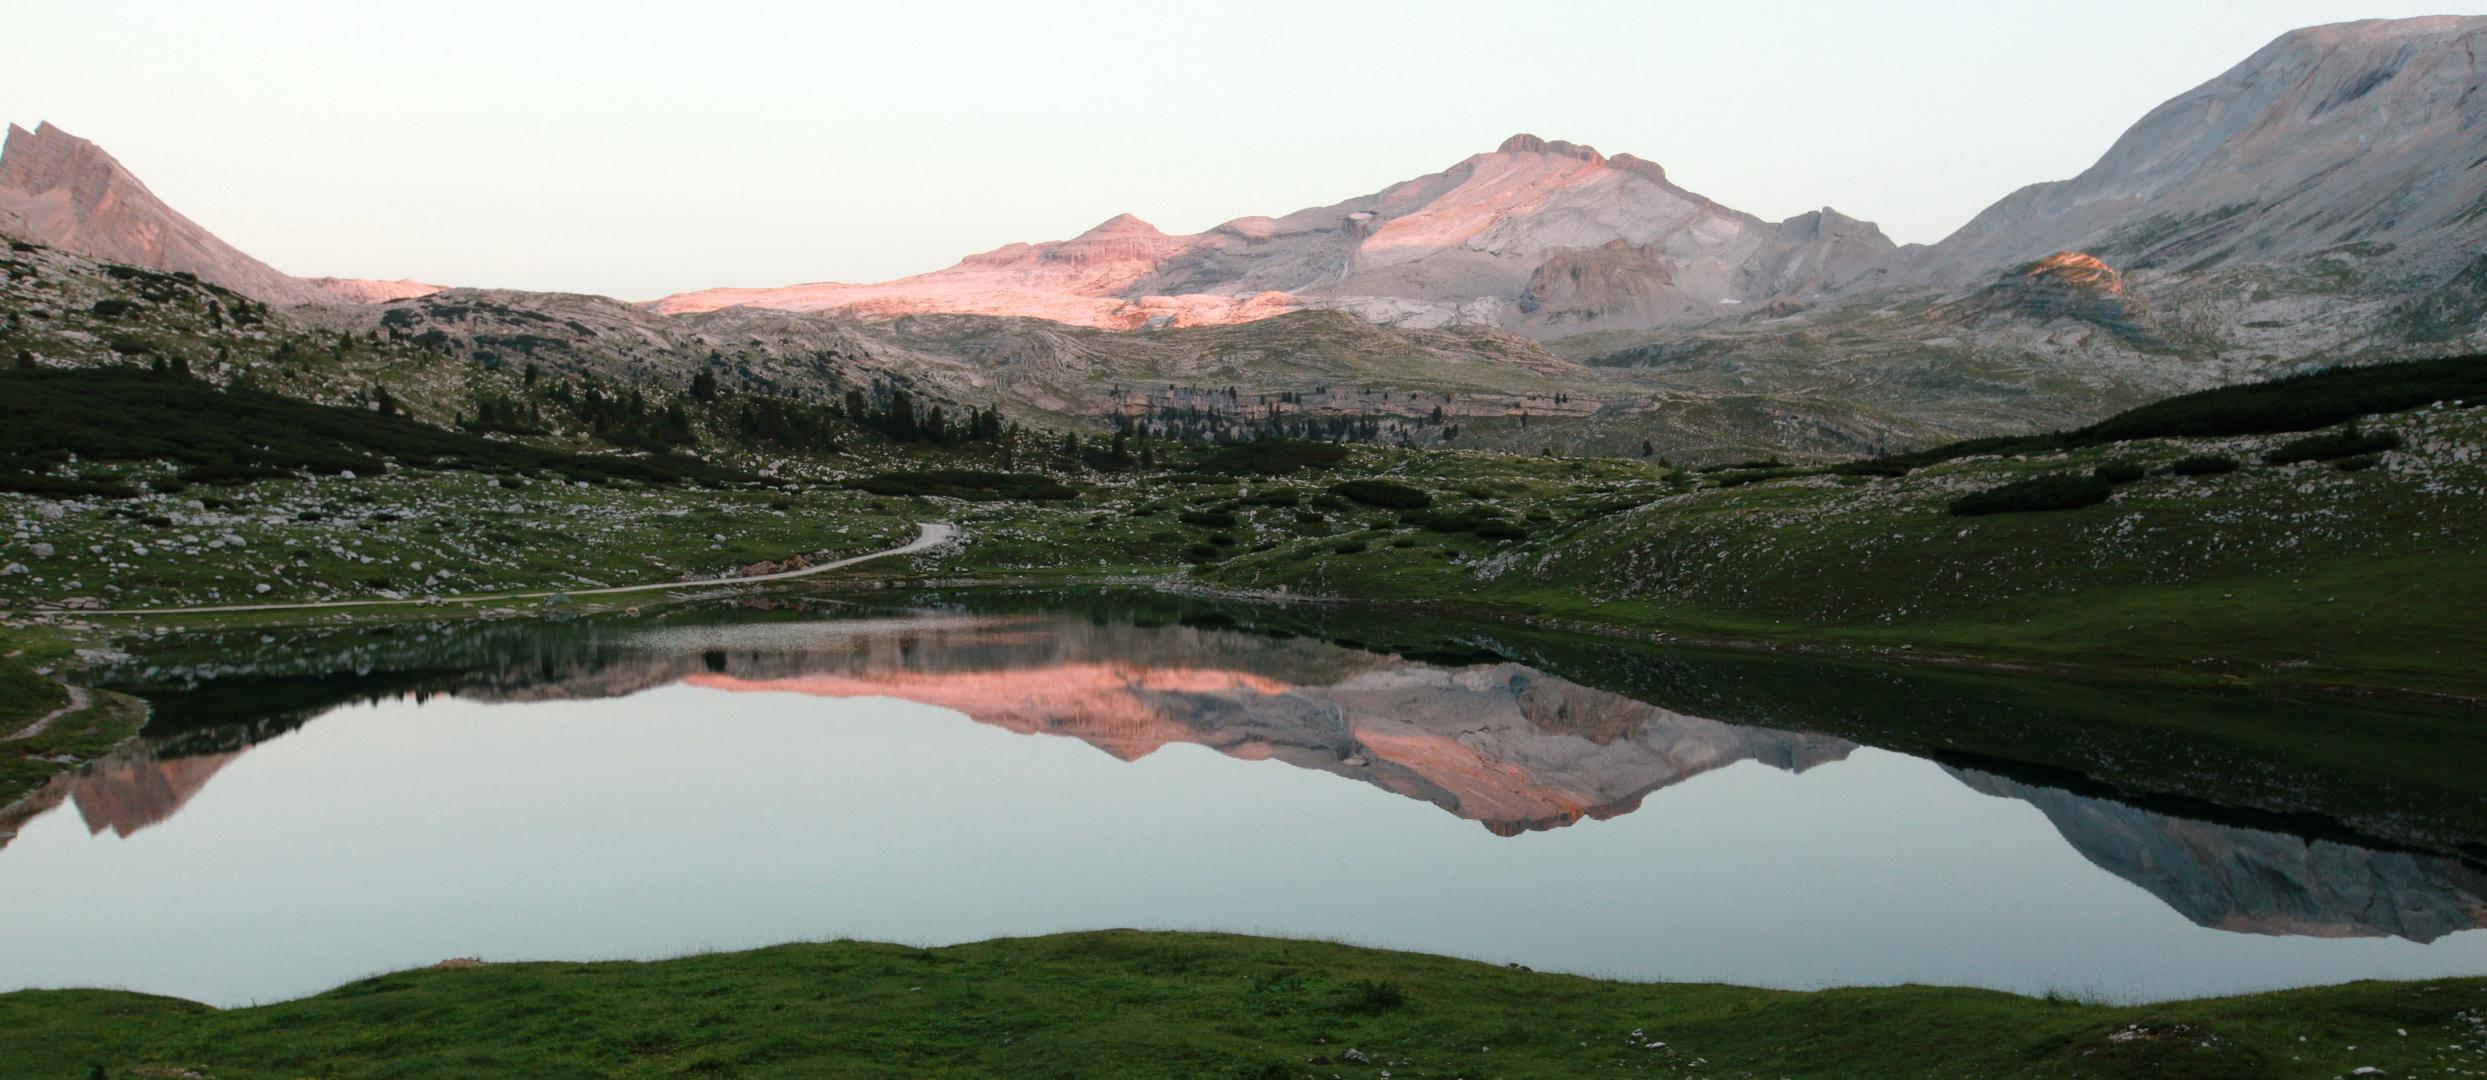 Limosee bei Sonnenaufgang im UNESCO Weltkulturerbe Dolomiten